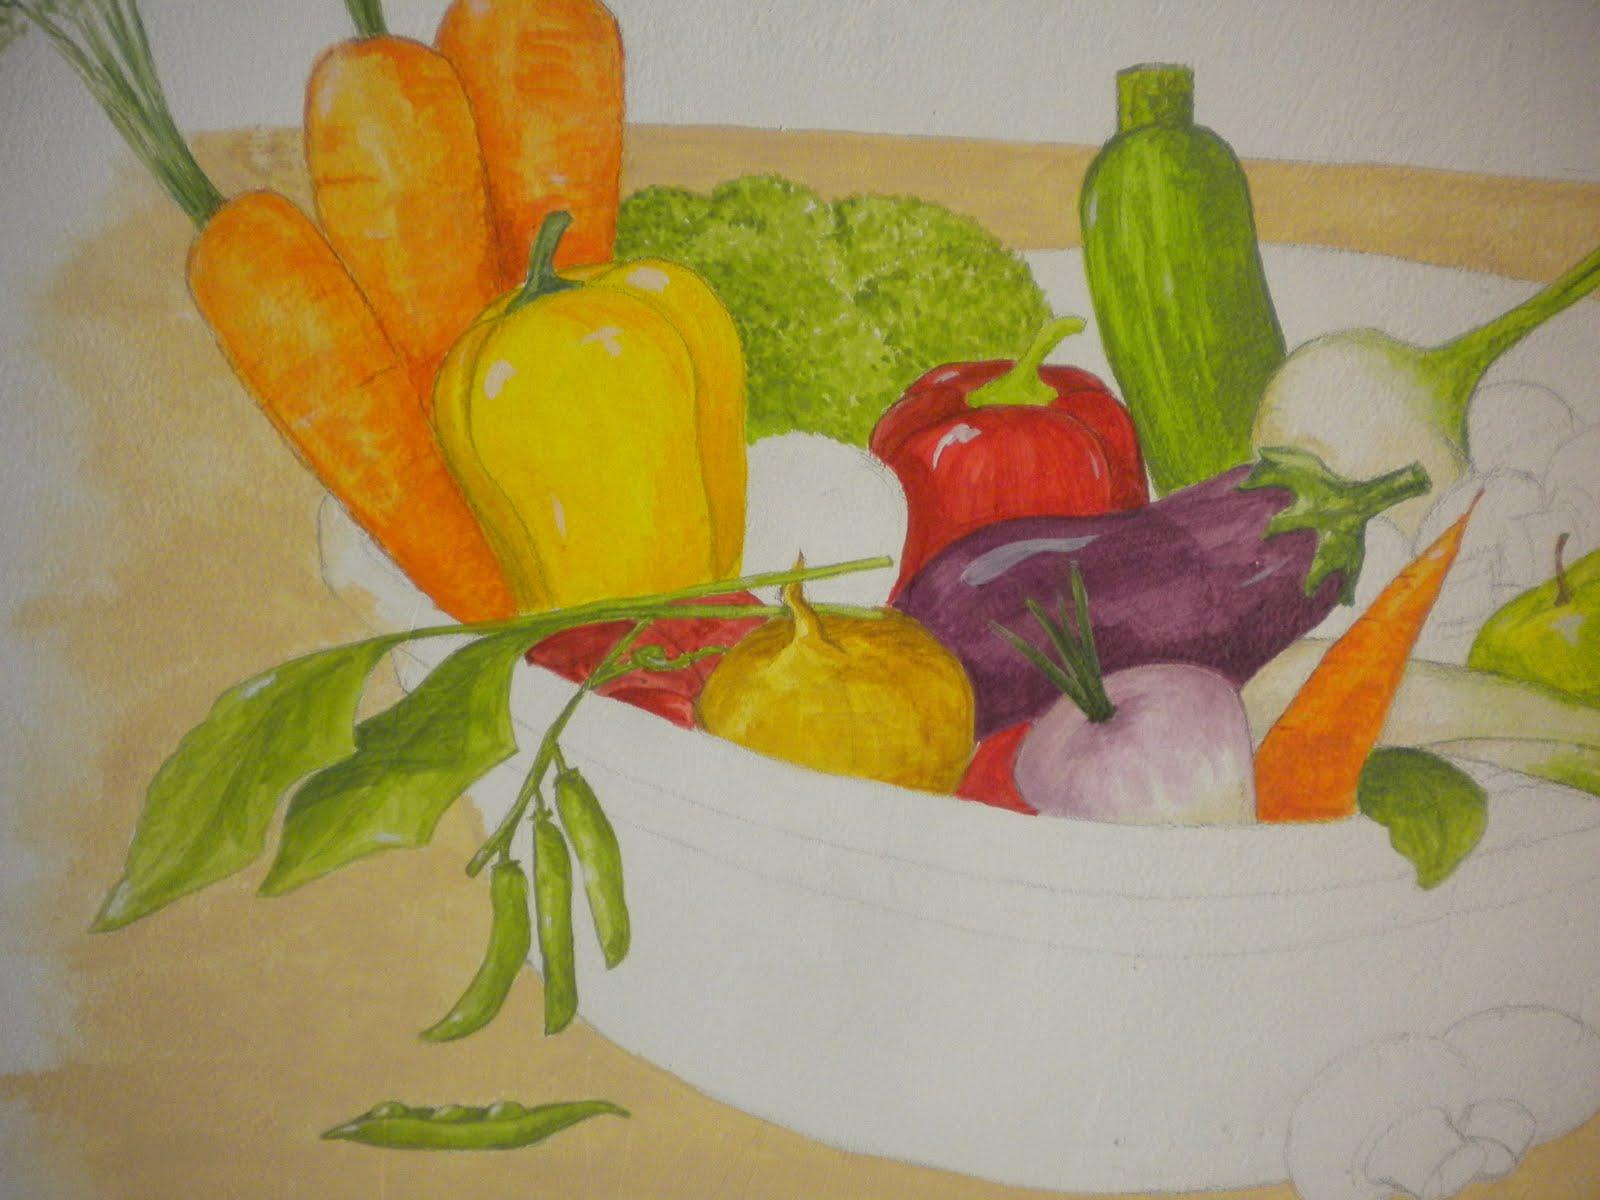 au jardin de chlo peinture cuisine avec l gumes pintura cocina con verduras. Black Bedroom Furniture Sets. Home Design Ideas